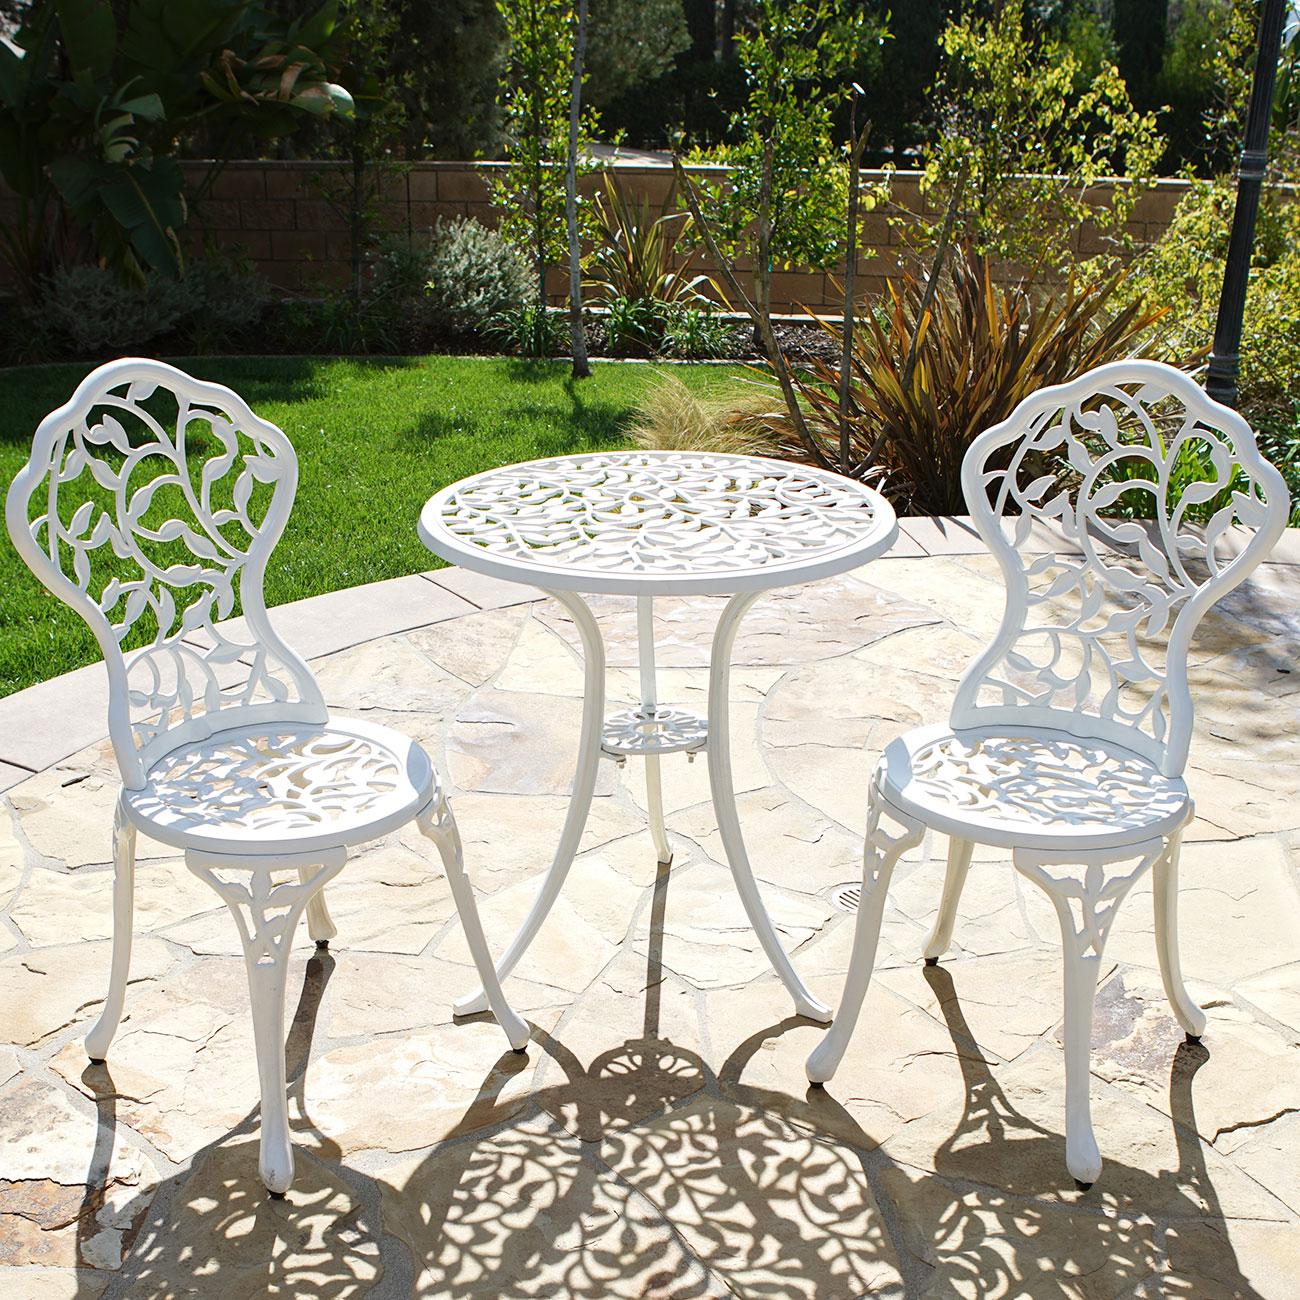 outdoor patio furniture 3pcs cast aluminum backyard bistro set in antique white ebay. Black Bedroom Furniture Sets. Home Design Ideas